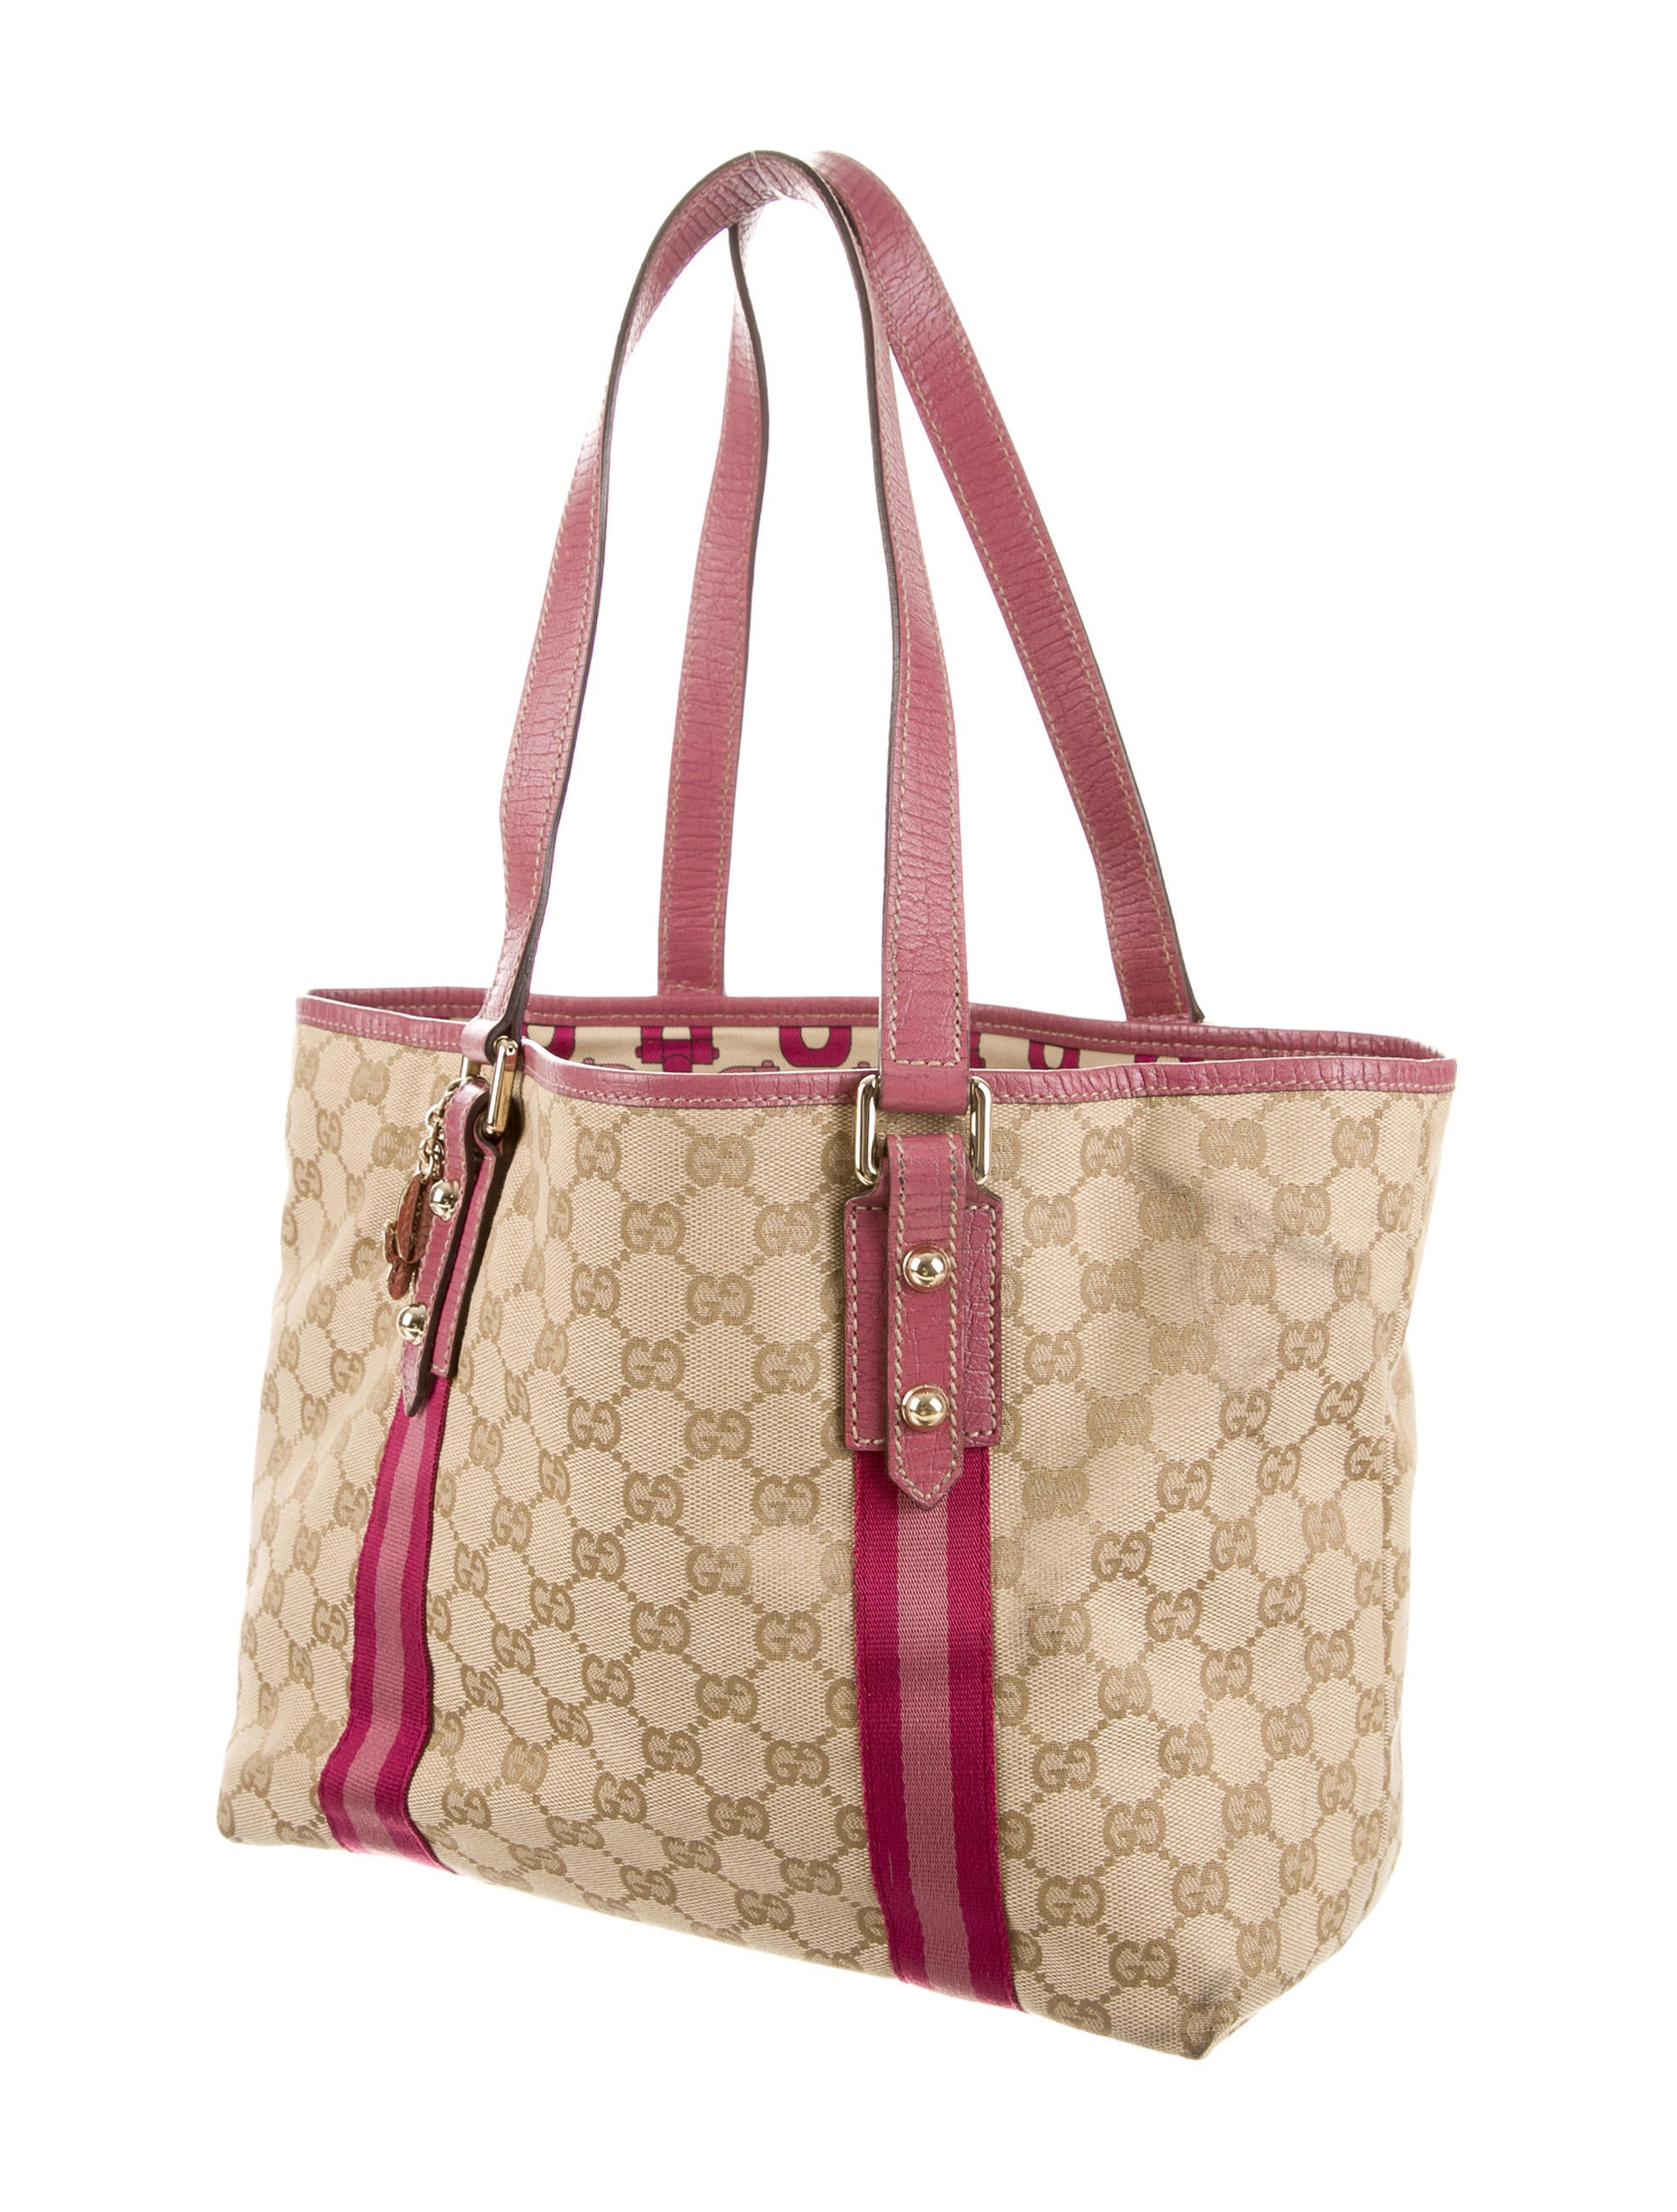 930badd091c Gucci Tote Handbags